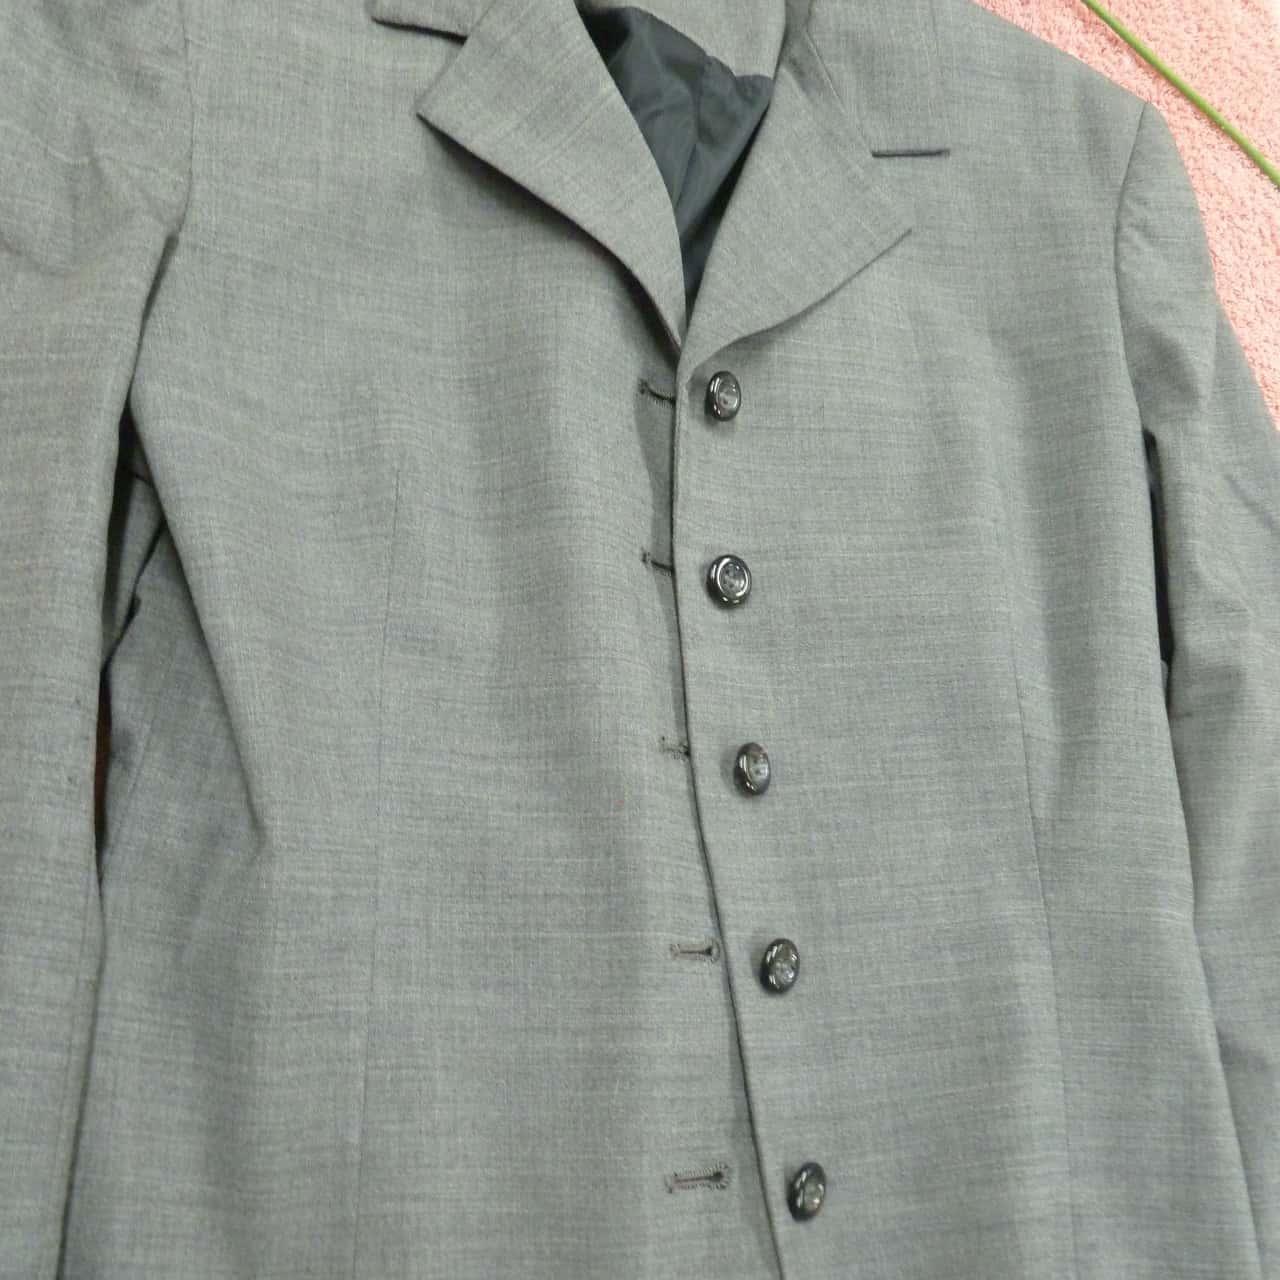 Pierucci, Women's Grey Blazer, Size 10, 97% WOOL